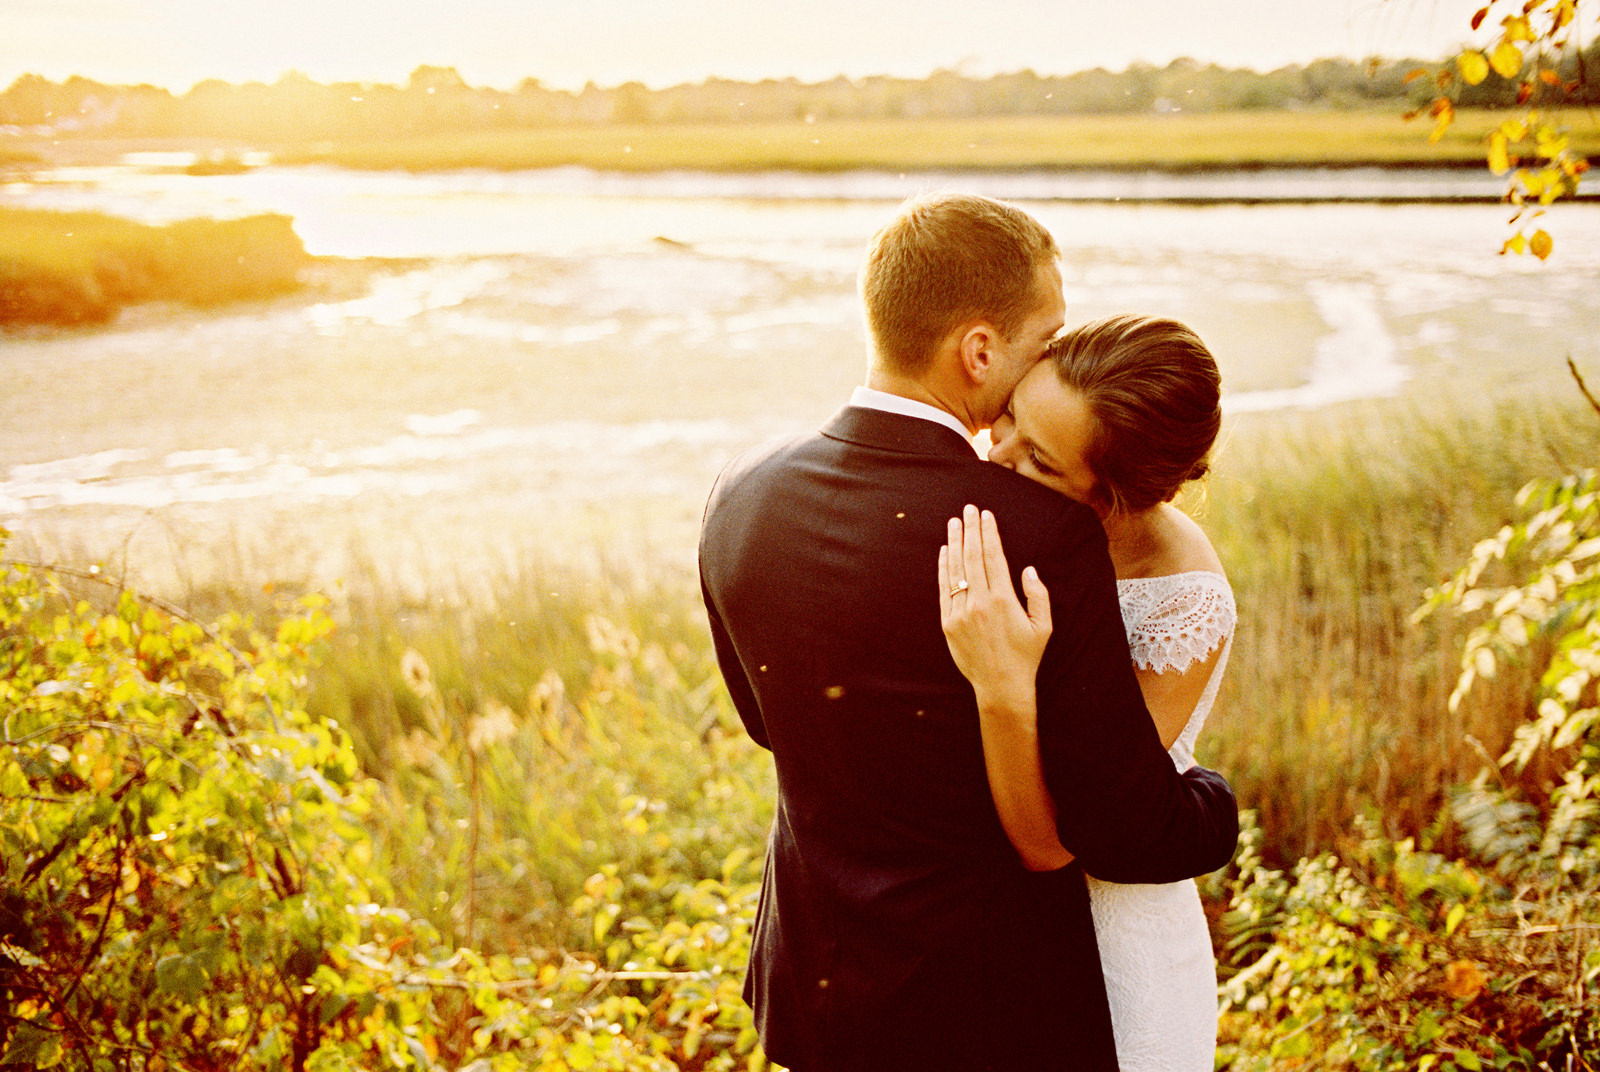 bridgeport-wedding-125 BRIDGEPORT, CONNECTICUT BACKYARD WEDDING